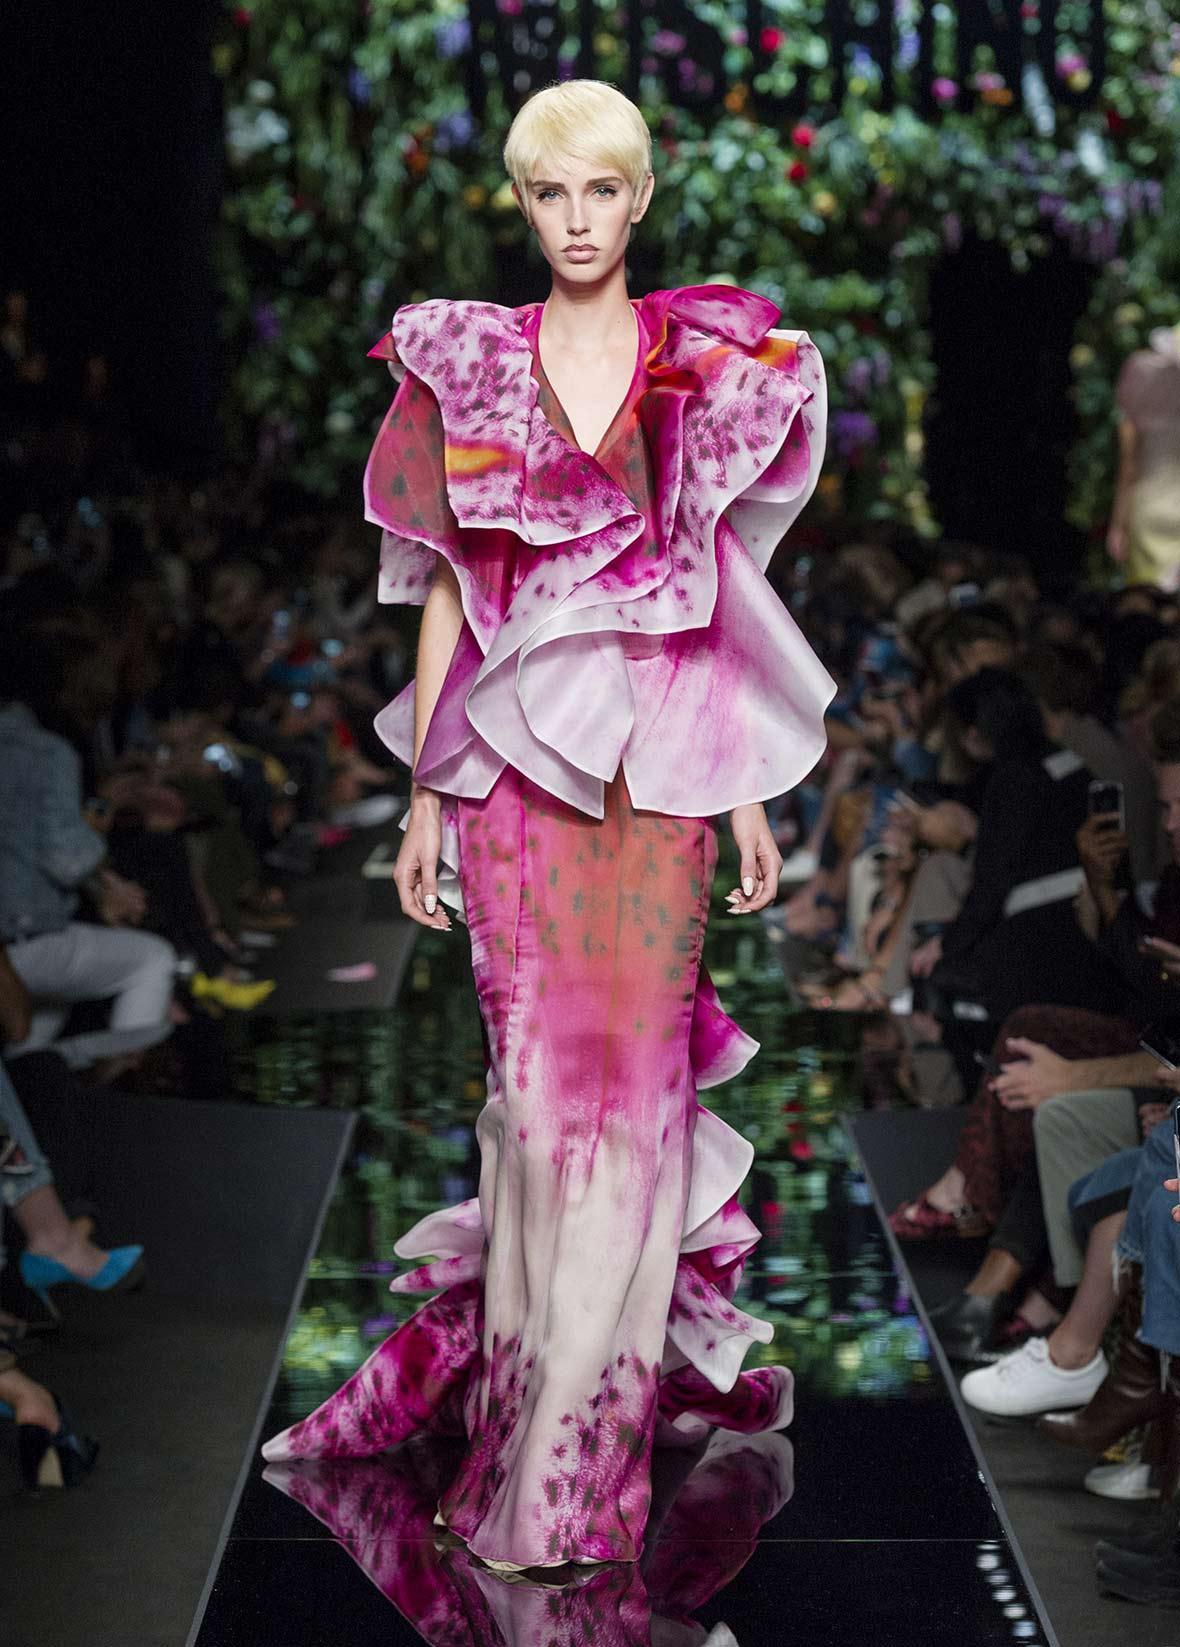 Moschino весна лето 2018 платье в виде орхидеи